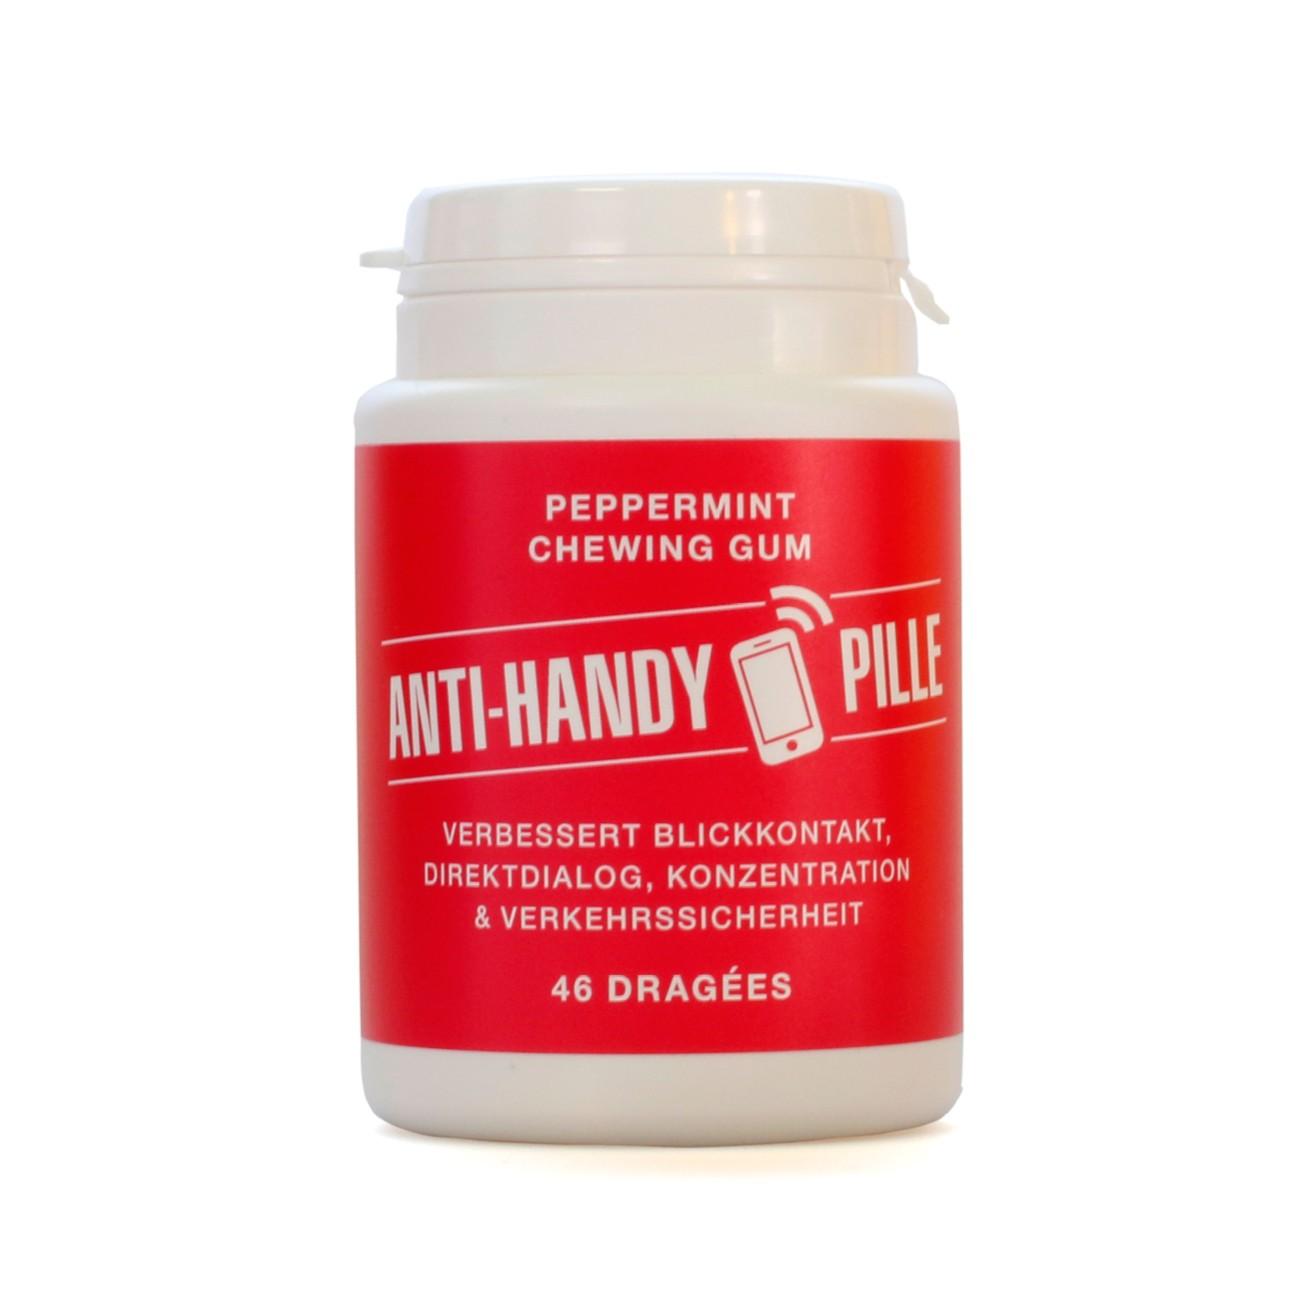 Image of Anti-Handy-Pille